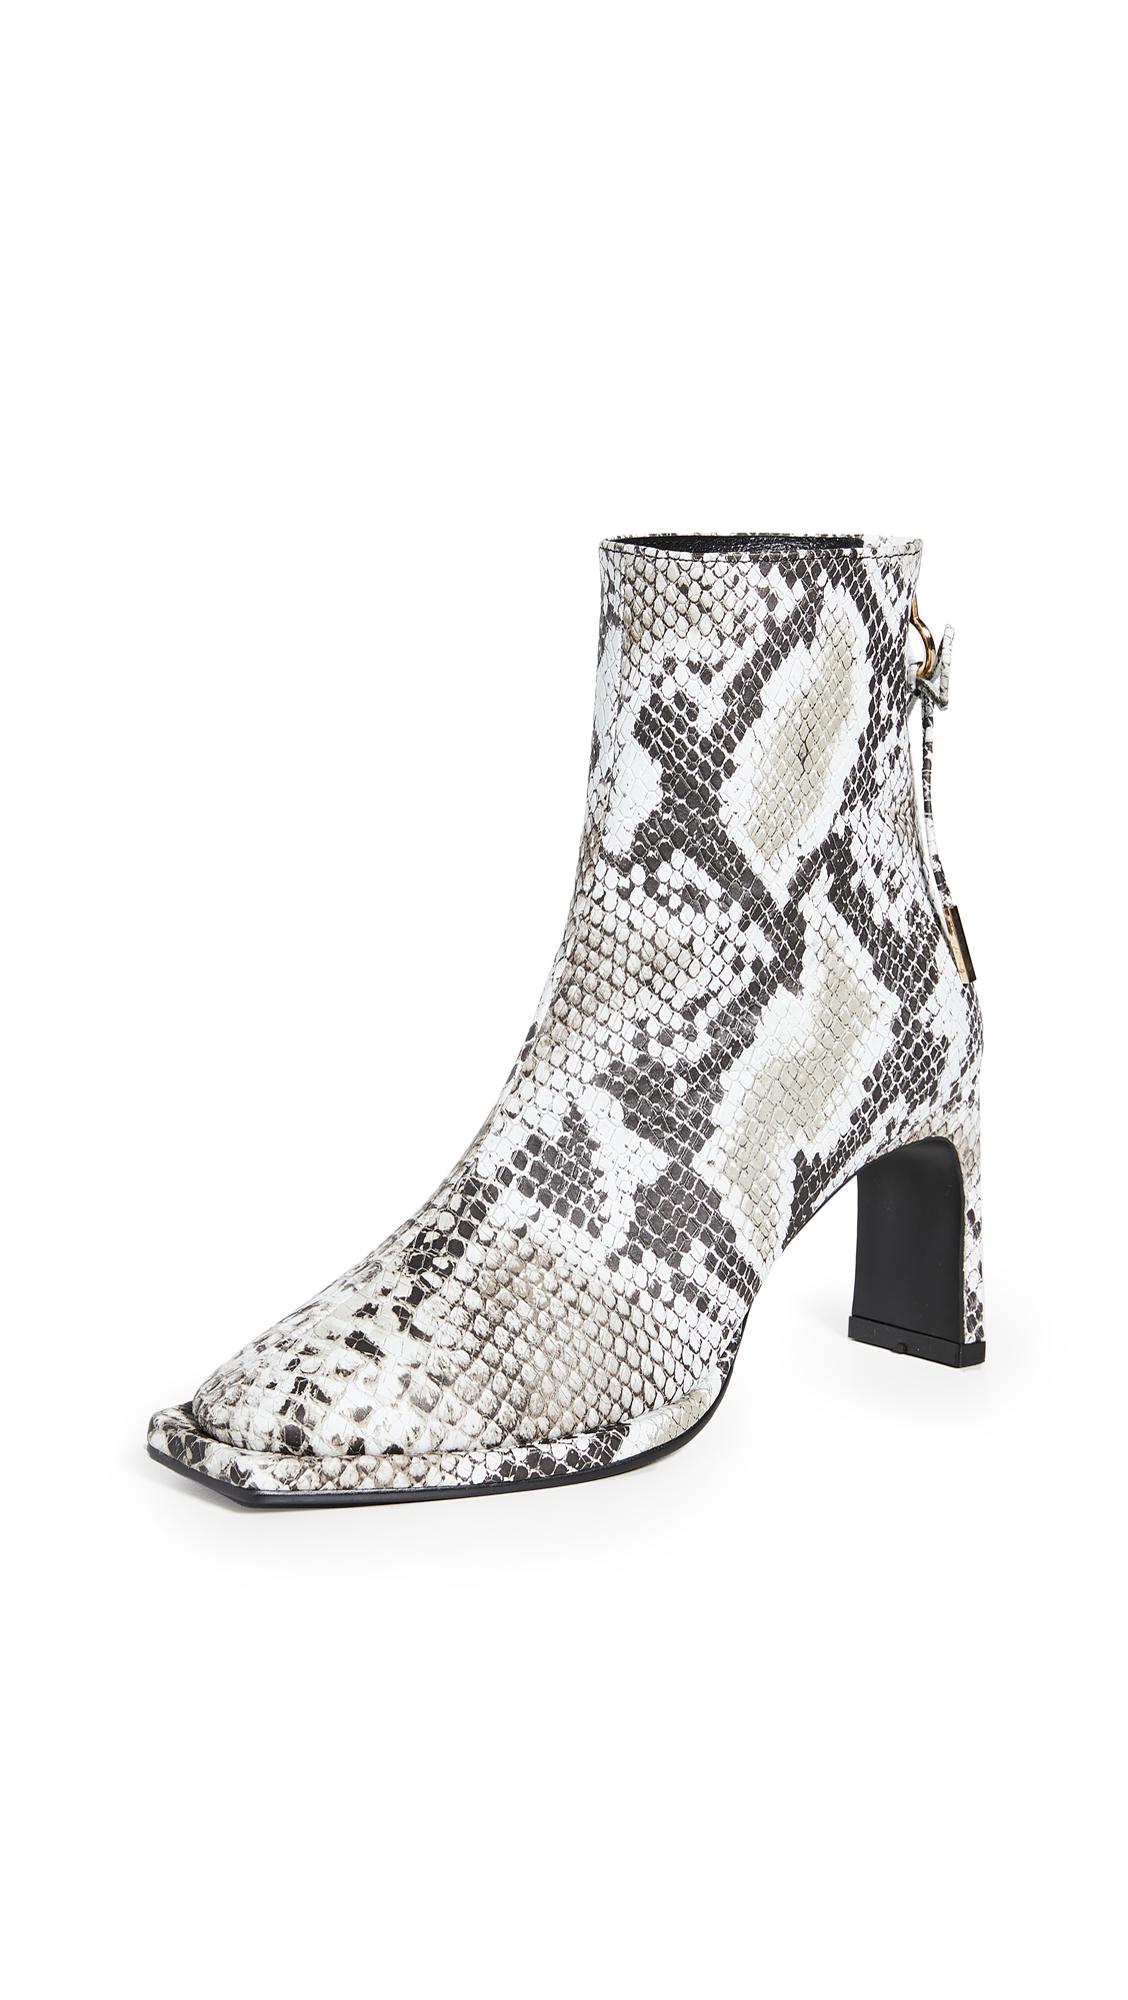 Reike Nen Ribbon Square Thin Boots - 60% Off Sale